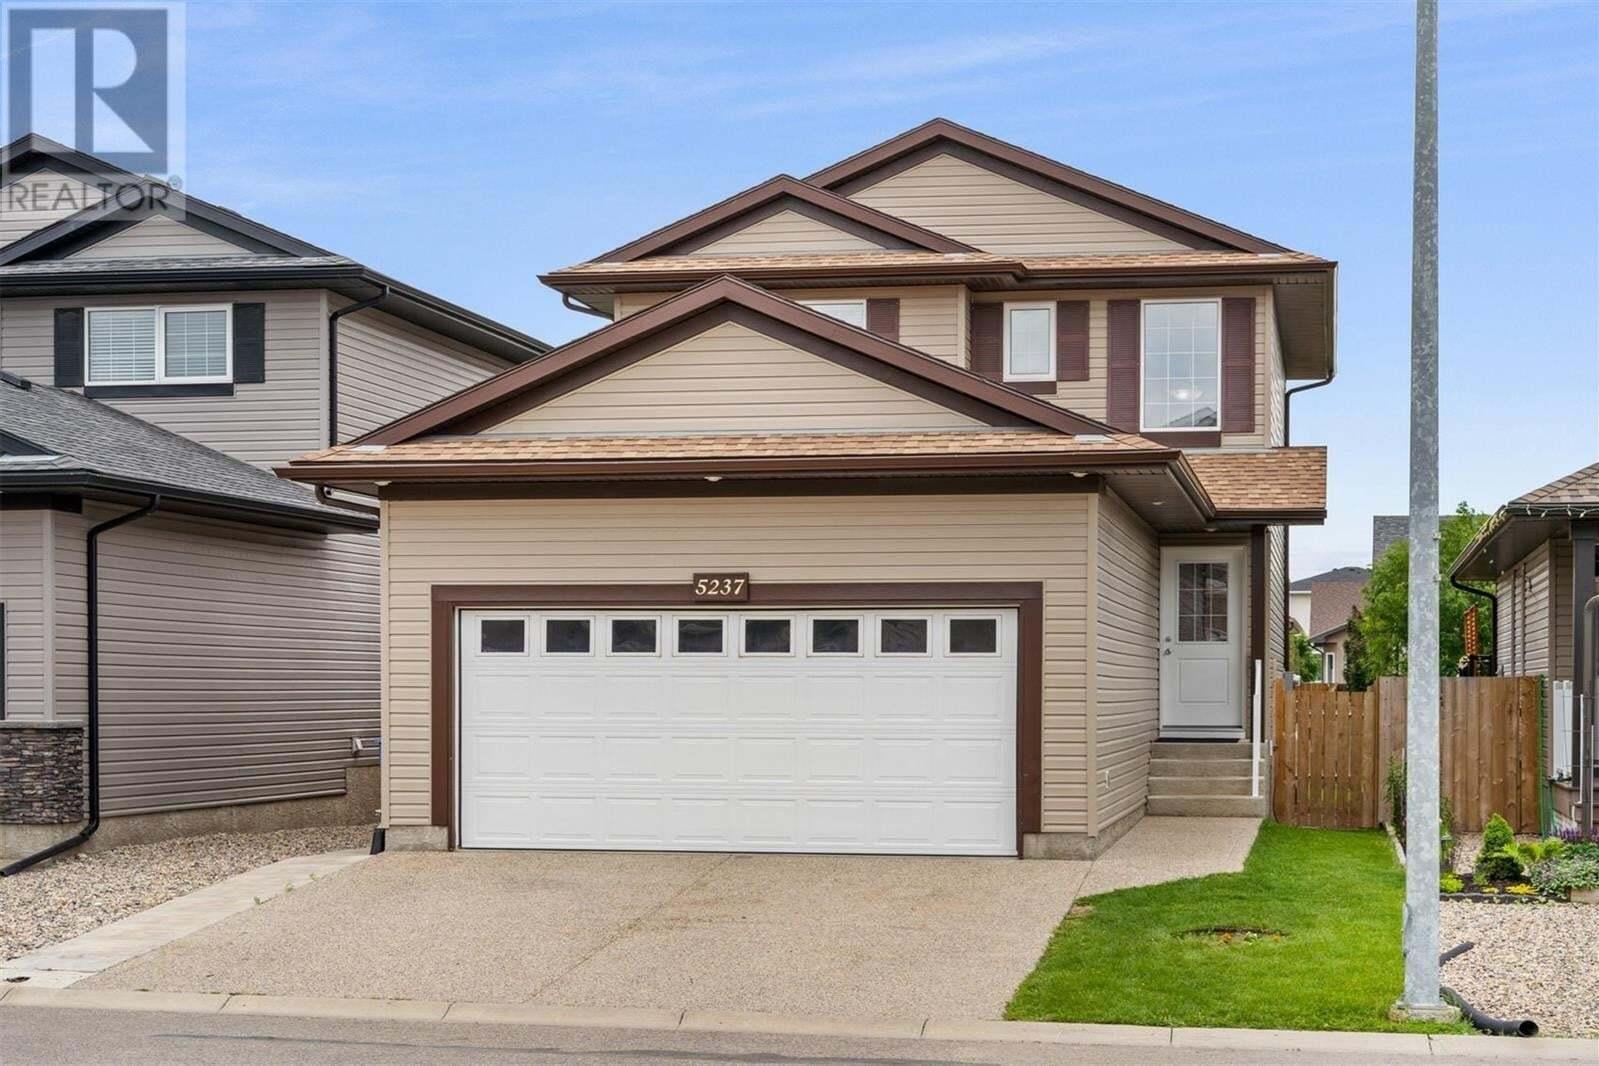 House for sale at 5237 Anthony Wy Regina Saskatchewan - MLS: SK816988